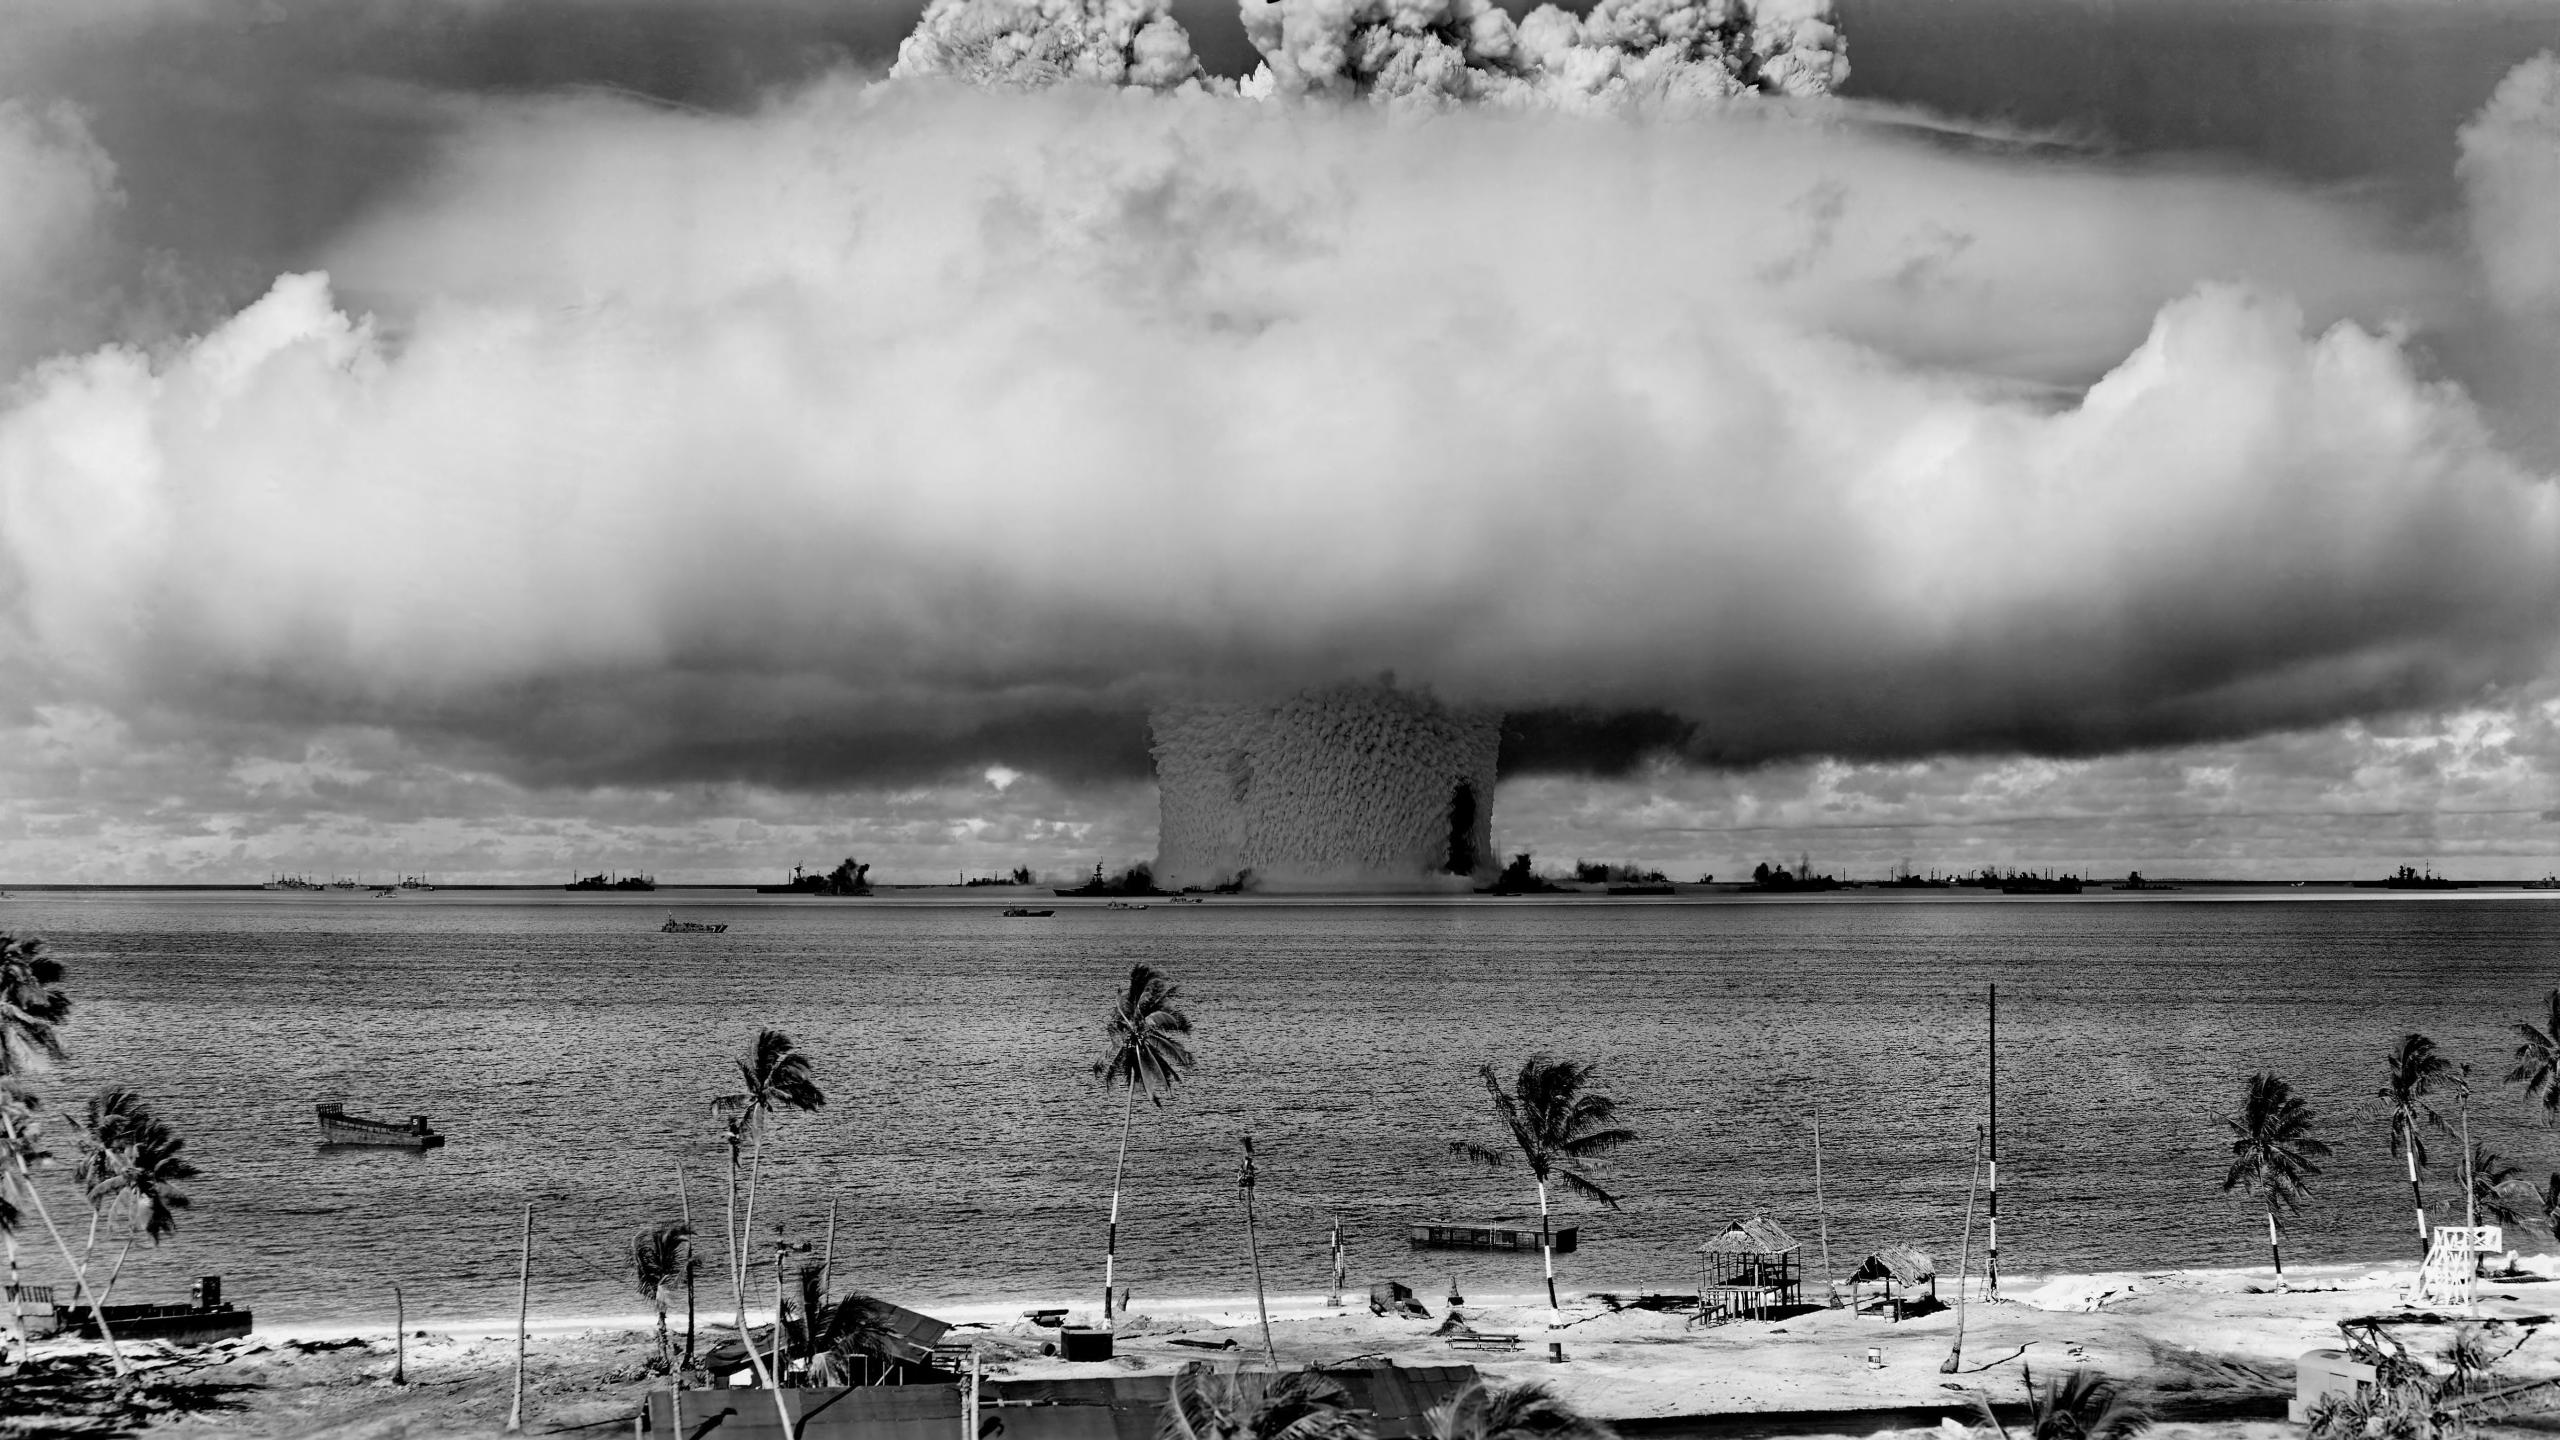 hydrogen-bomb.jpg